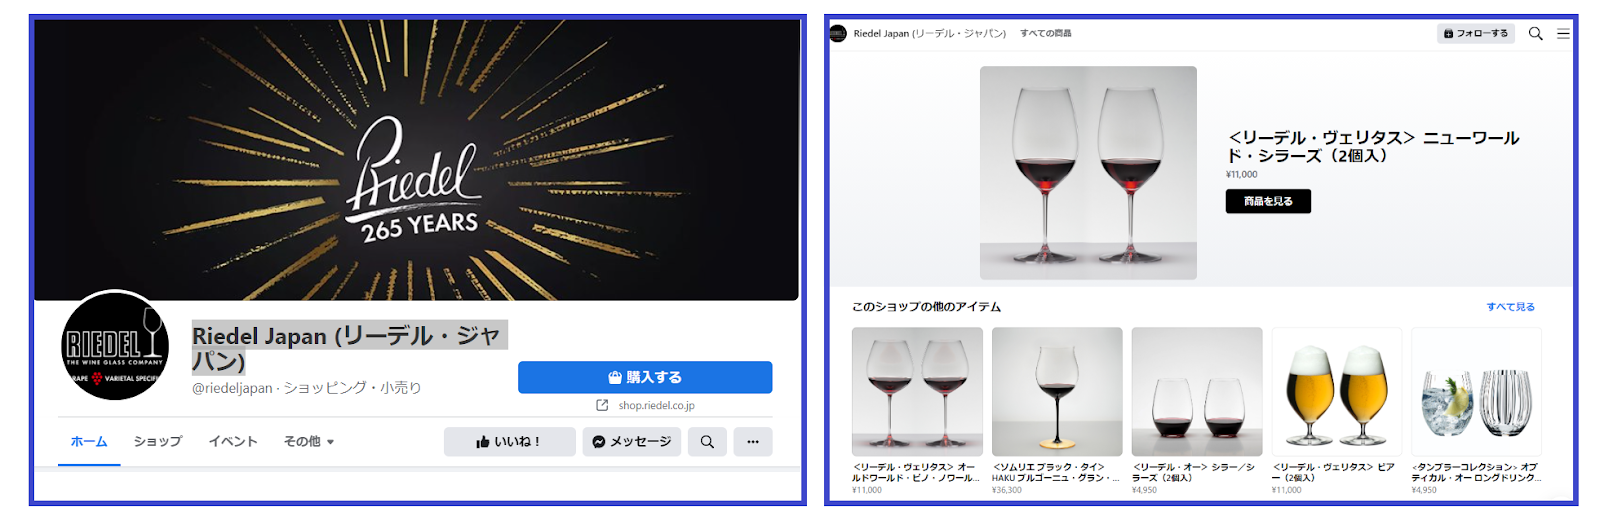 facebookショップ Riedel Japan (リーデル・ジャパン)